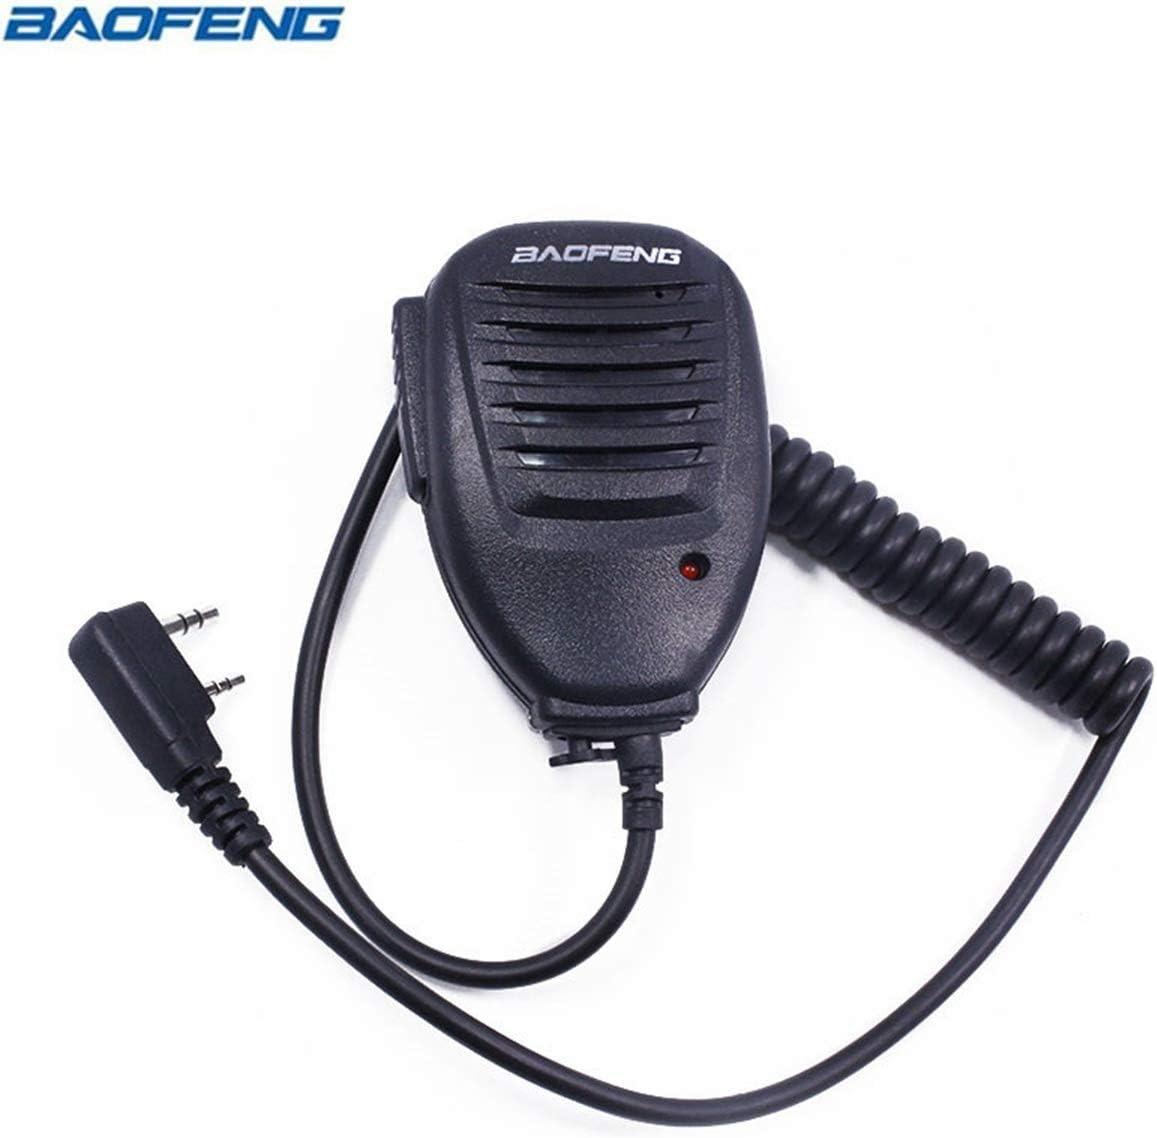 Amazon.com: BF 8 Pin Handheld Remote Radio Speaker Mic for Baofeng